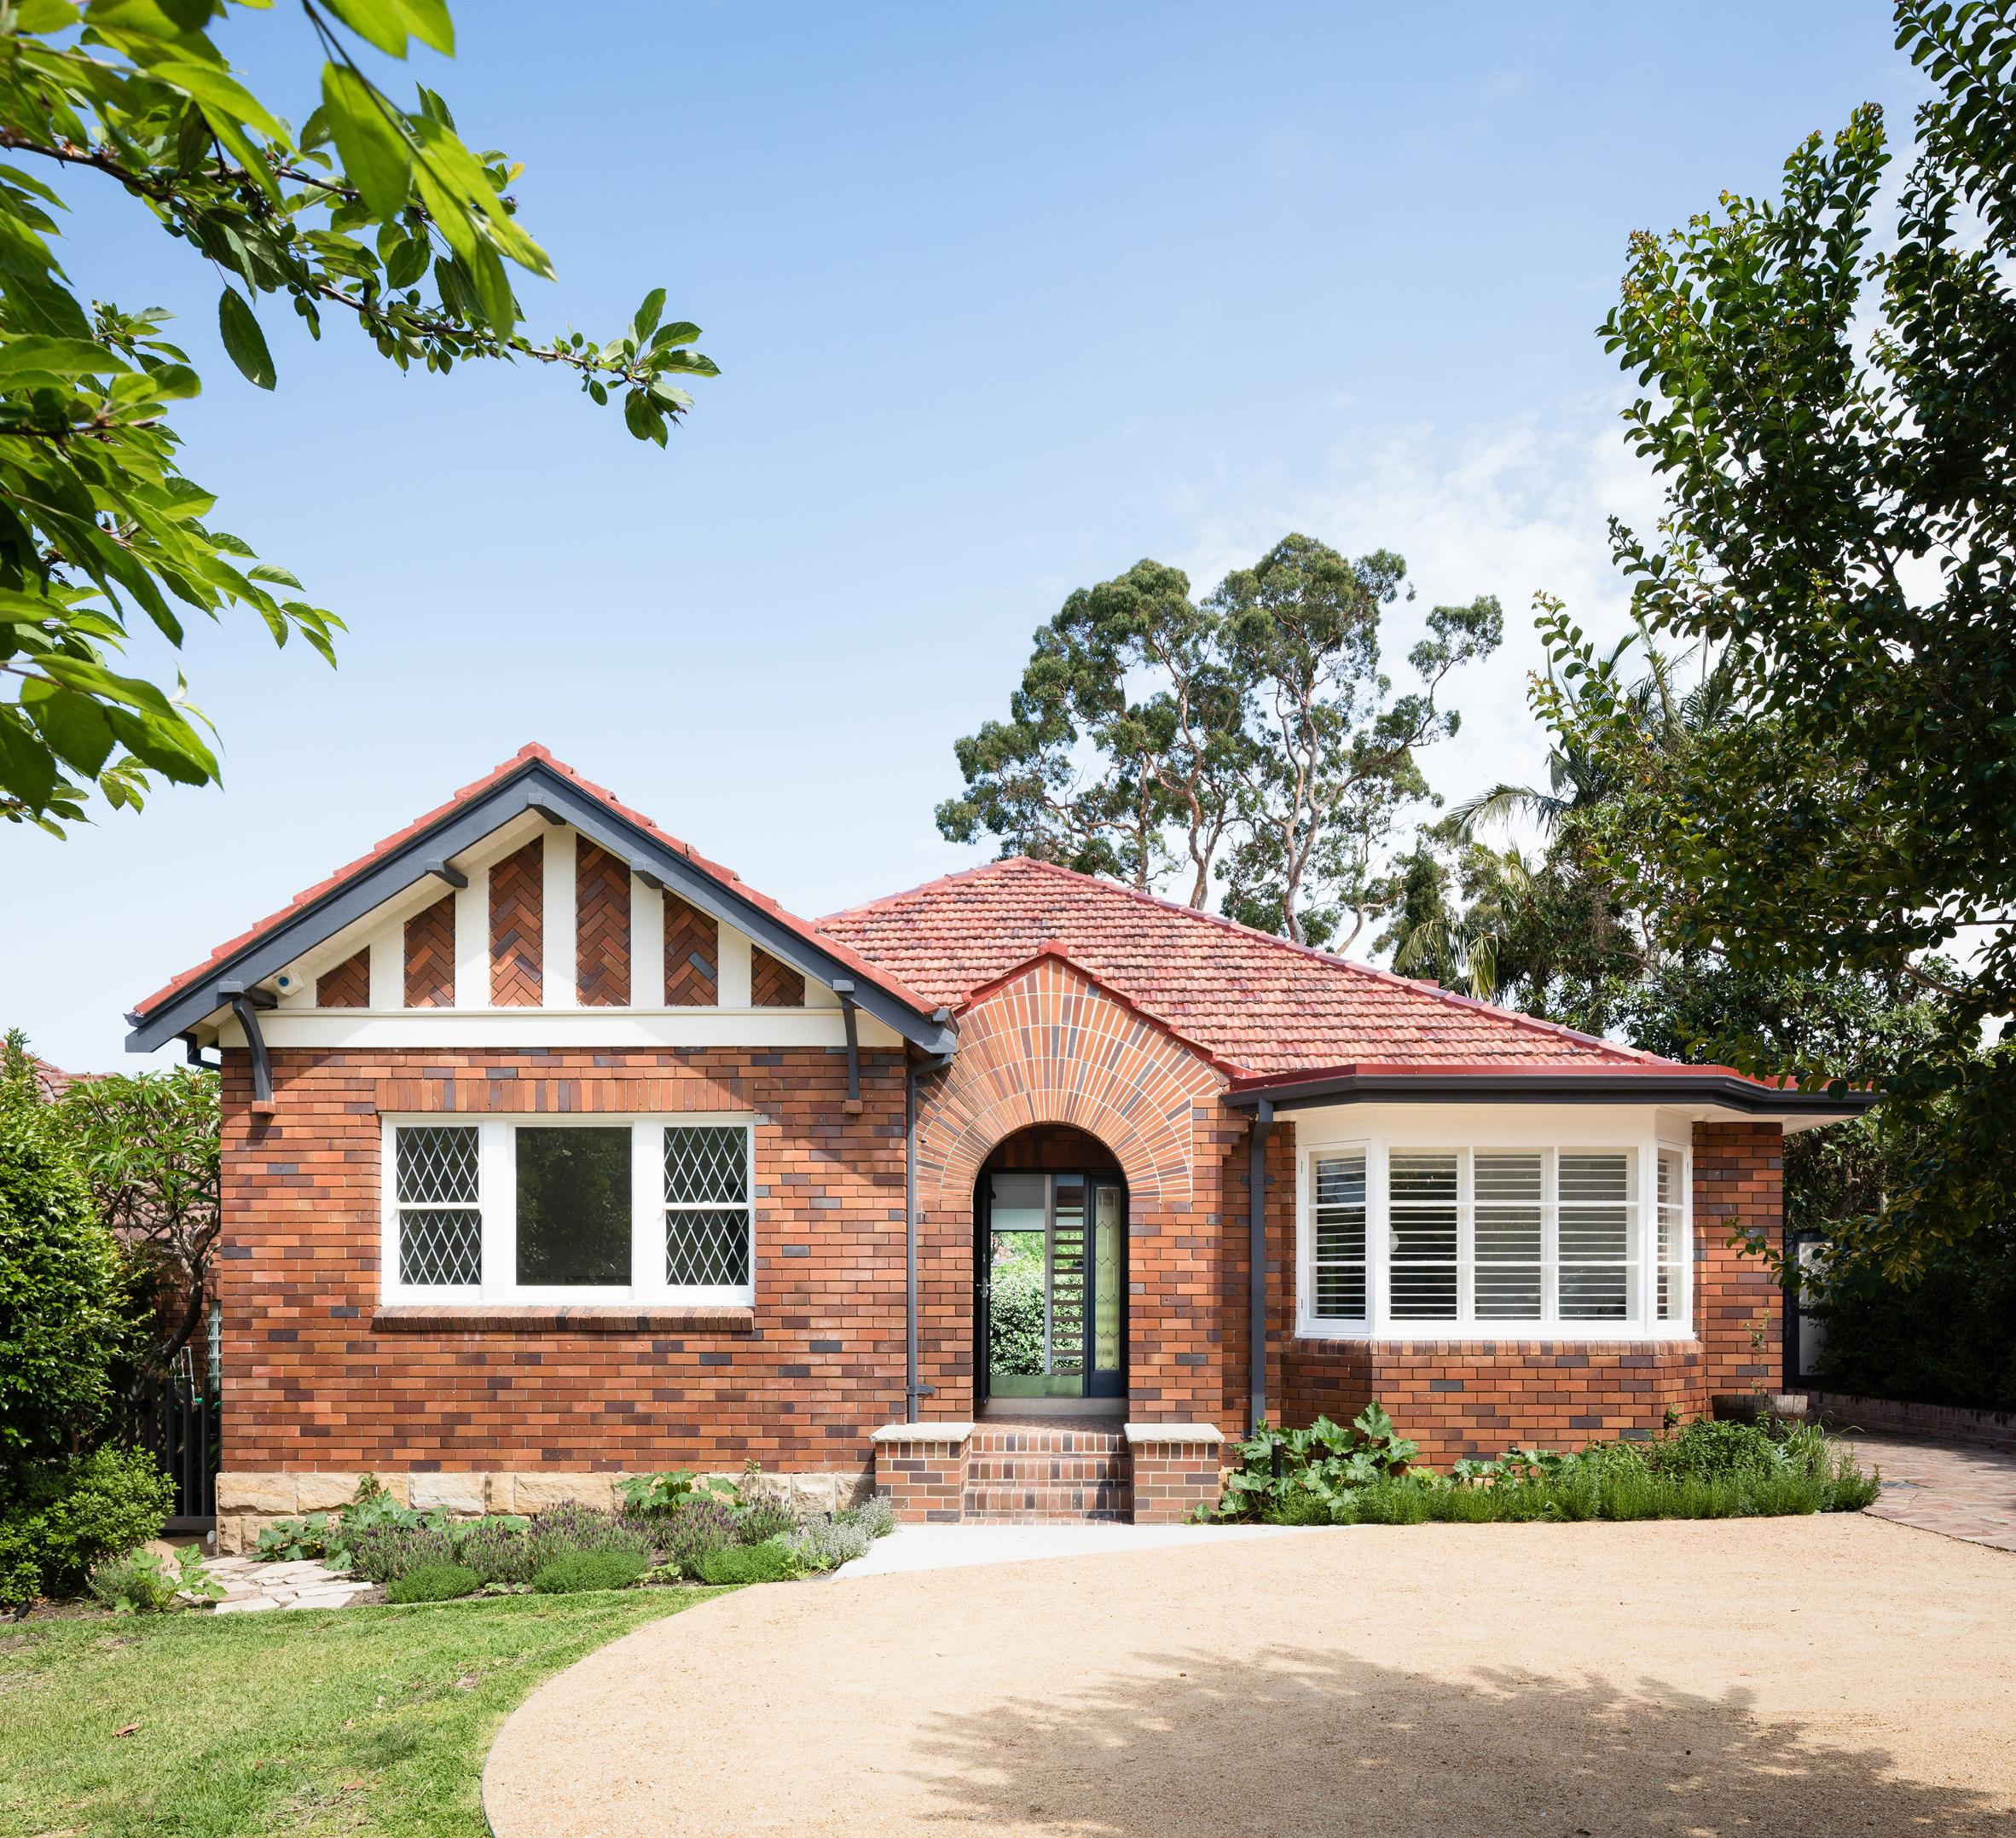 suburban-canny-tribe-studio-australian-houses-architecture-residential_dezeen_2364_col_12.jpg